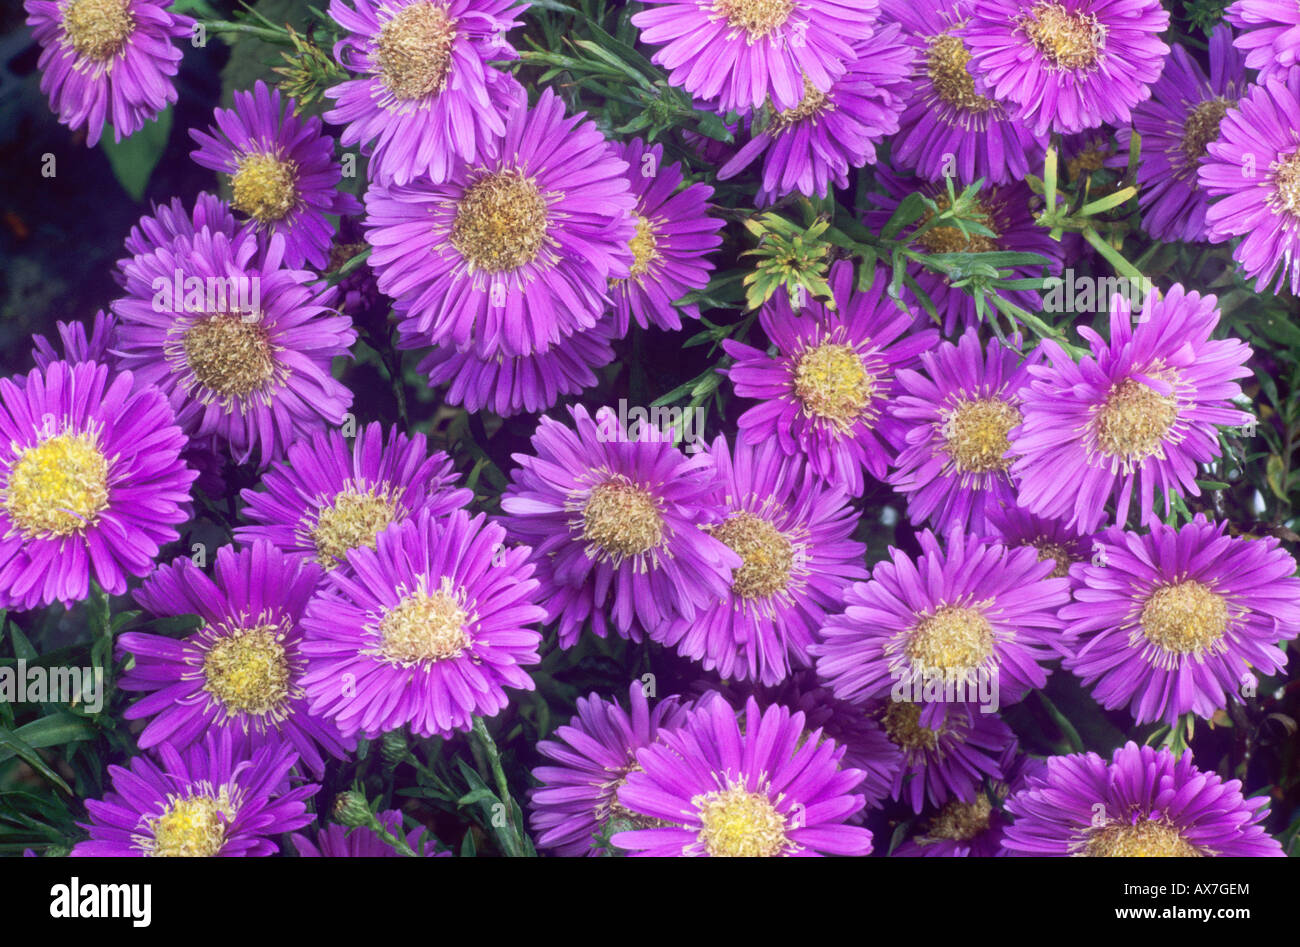 aster dumosus 'sapphire' pink purple flower garden plant stock